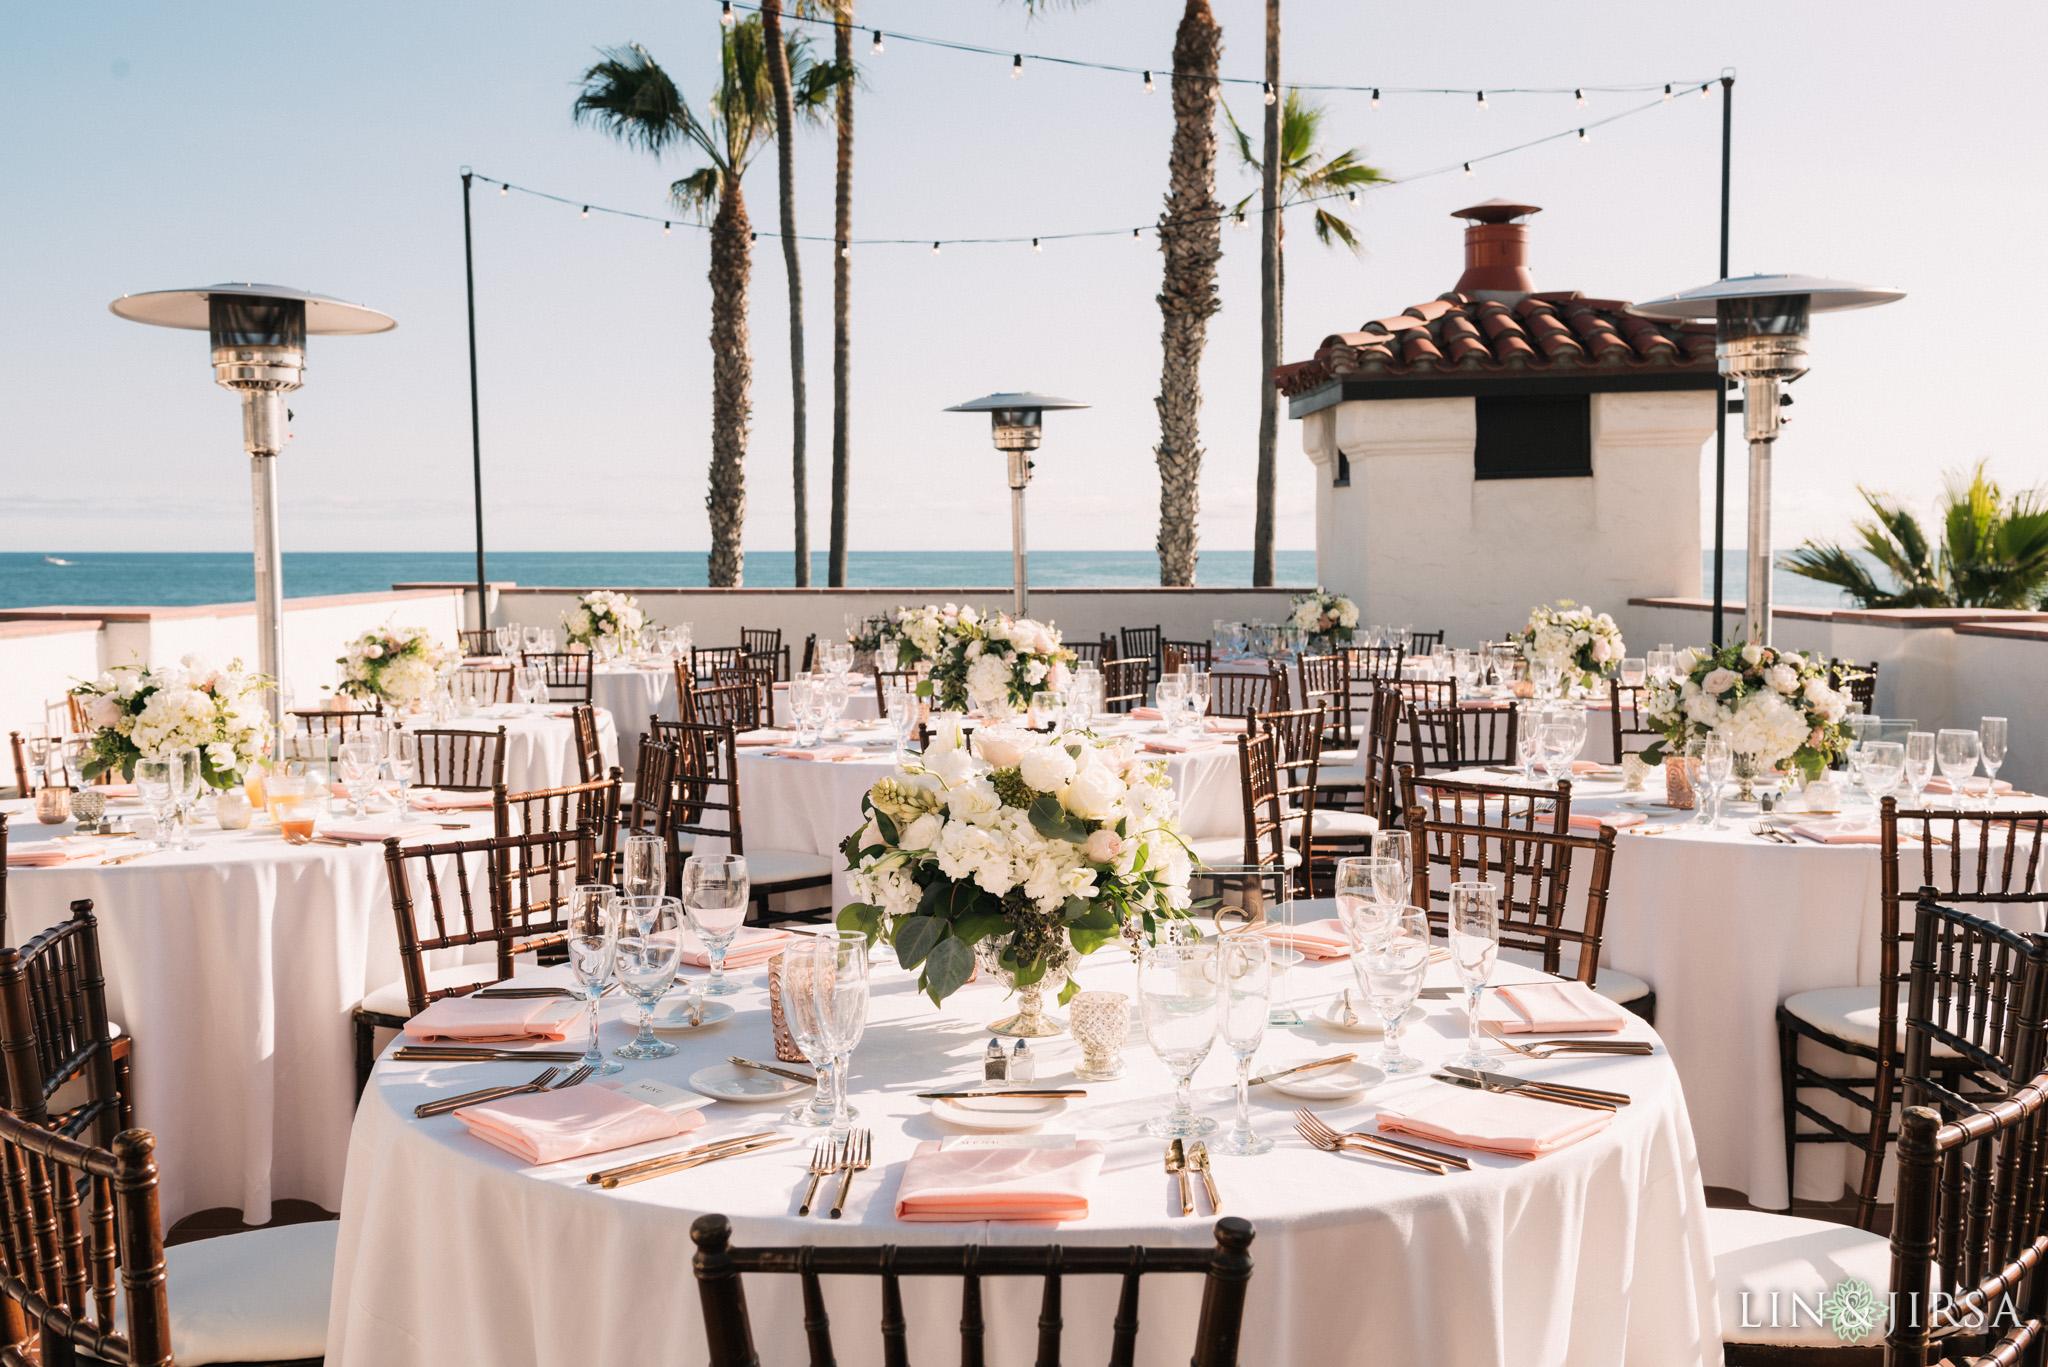 43 ole hanson beach club san clemente wedding reception photography